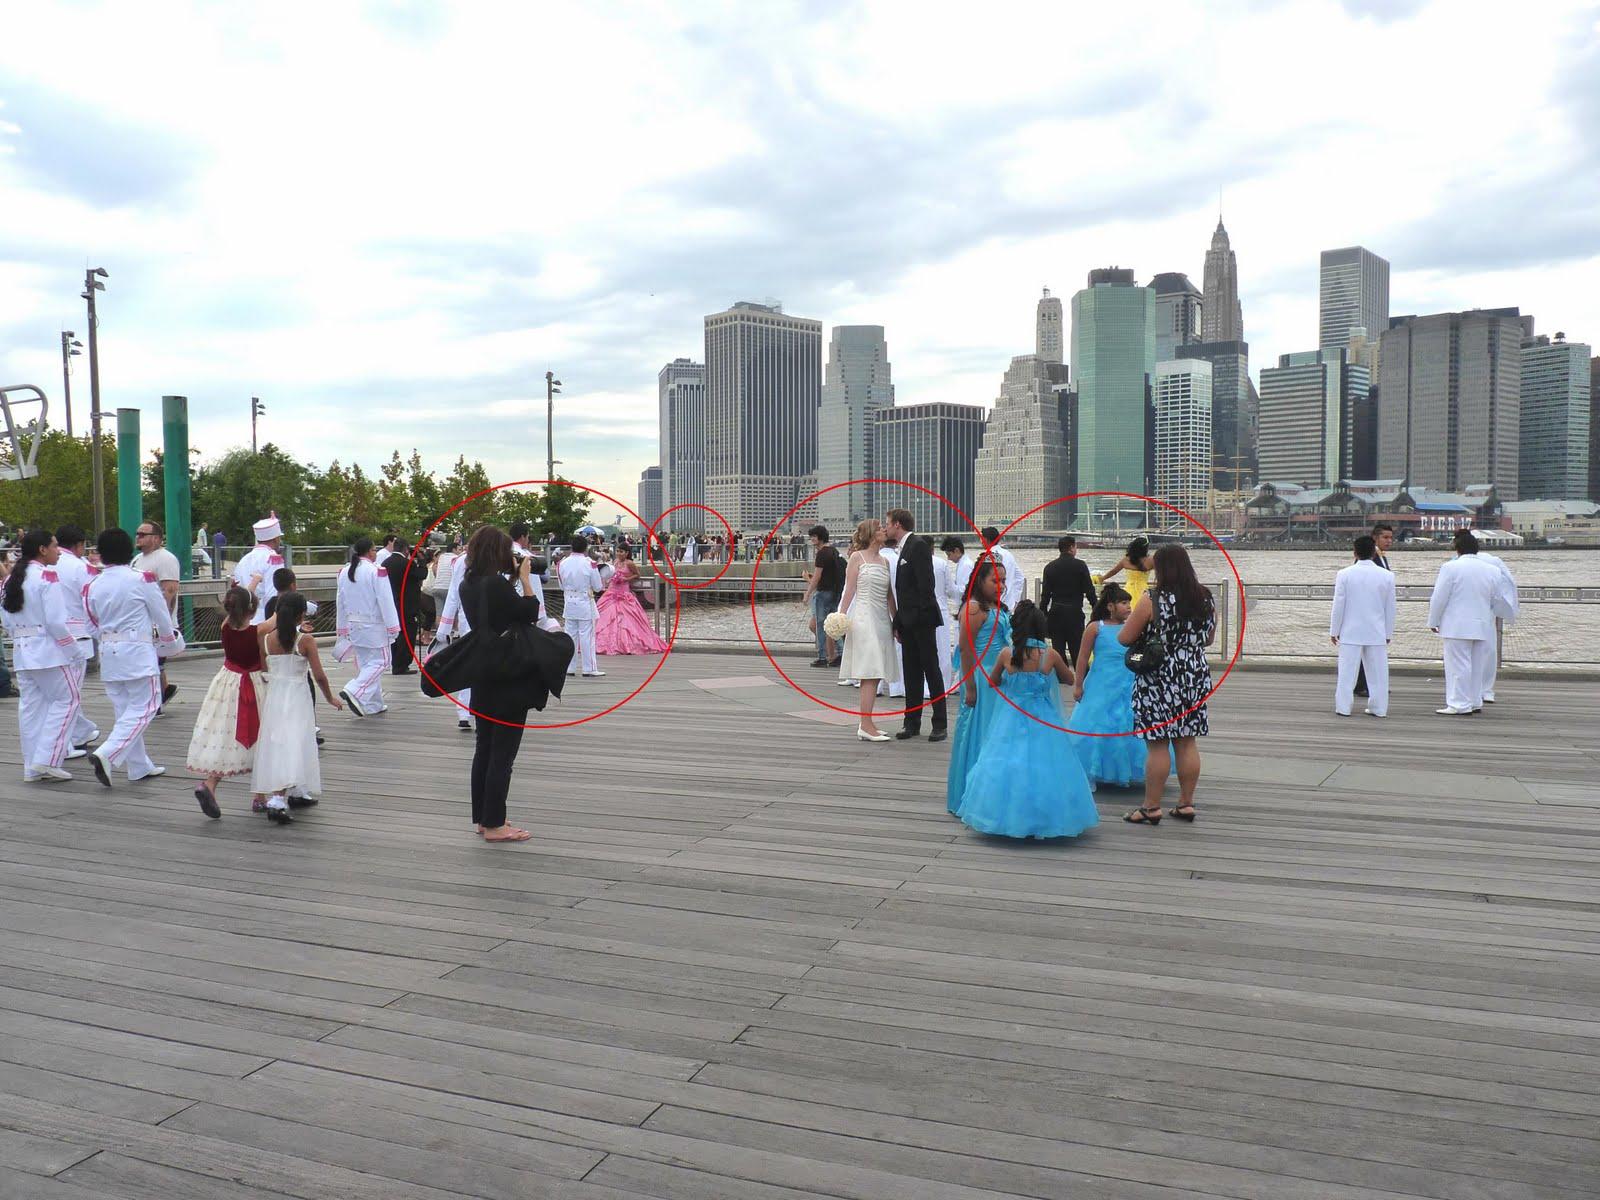 http://3.bp.blogspot.com/-T2hGnbPNQSo/TmxevMTshzI/AAAAAAAAIJU/yD4yLz4BQJU/s1600/weddings2_MKMetz_9-10-11_1.JPG